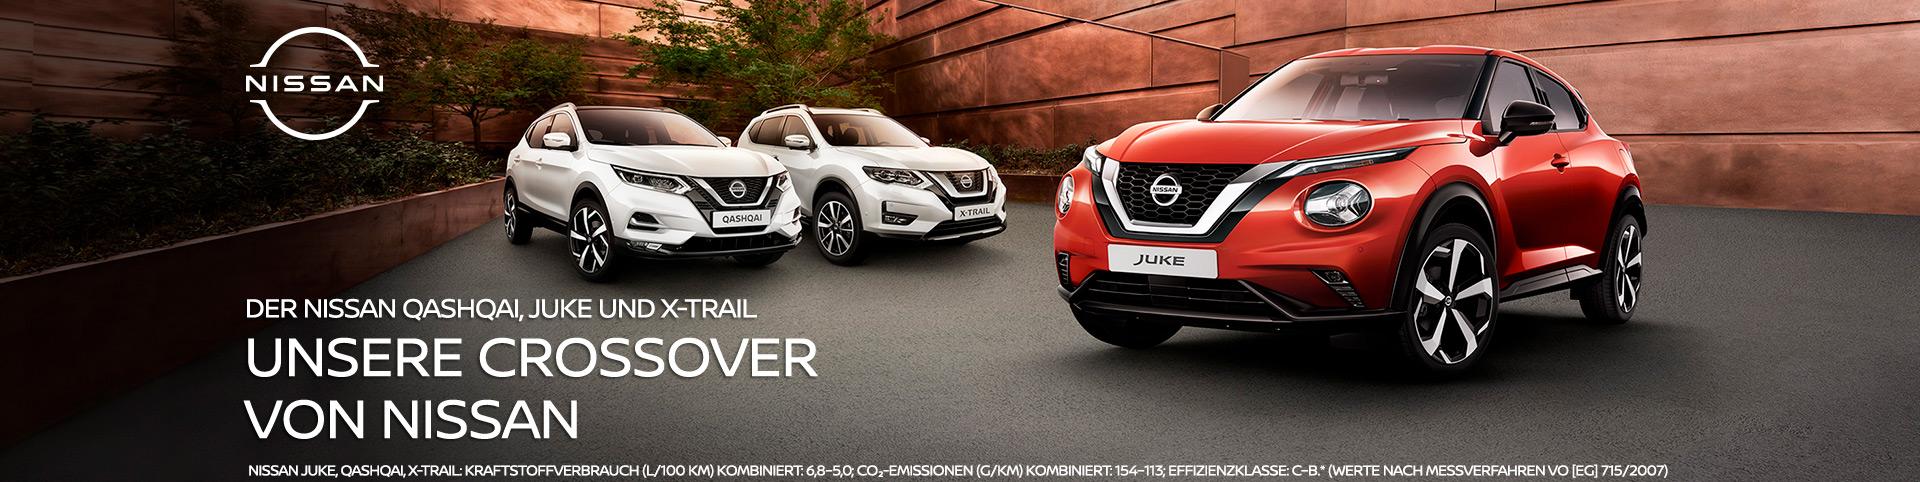 Nissan Crossover Autozentren P&A-Preckel